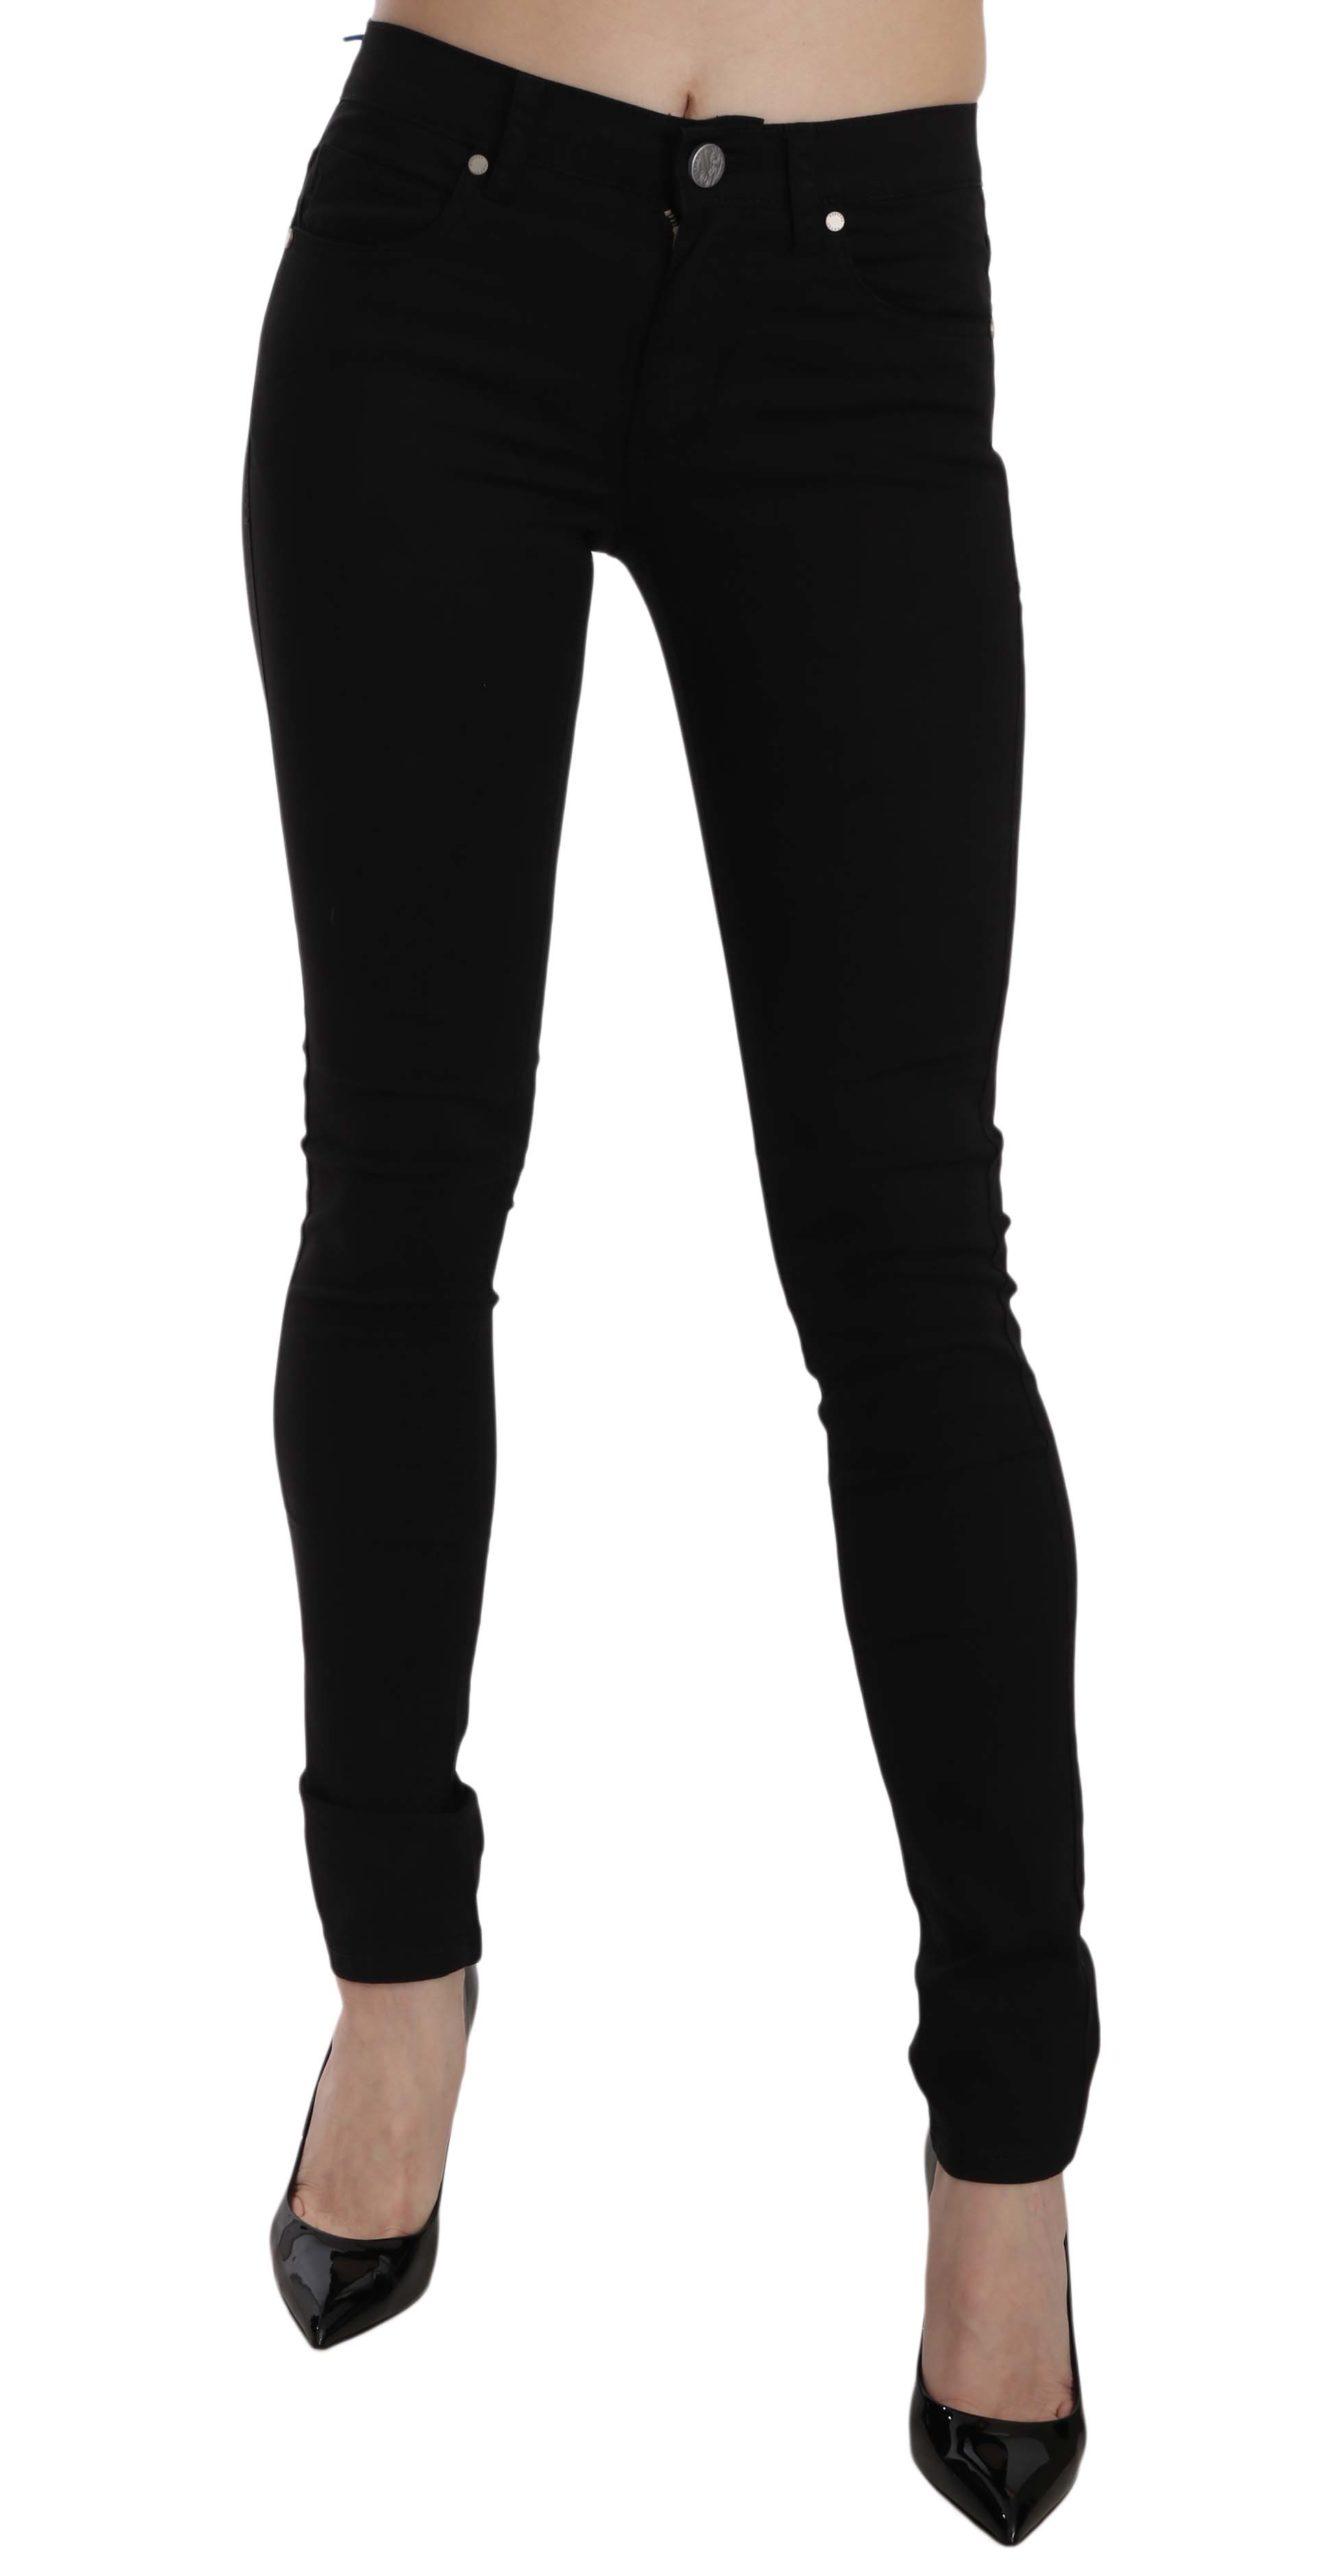 Versace Jeans Women's Tiger Logo Gabardine Slim-Fit Trouser Black PAN61014 - W27